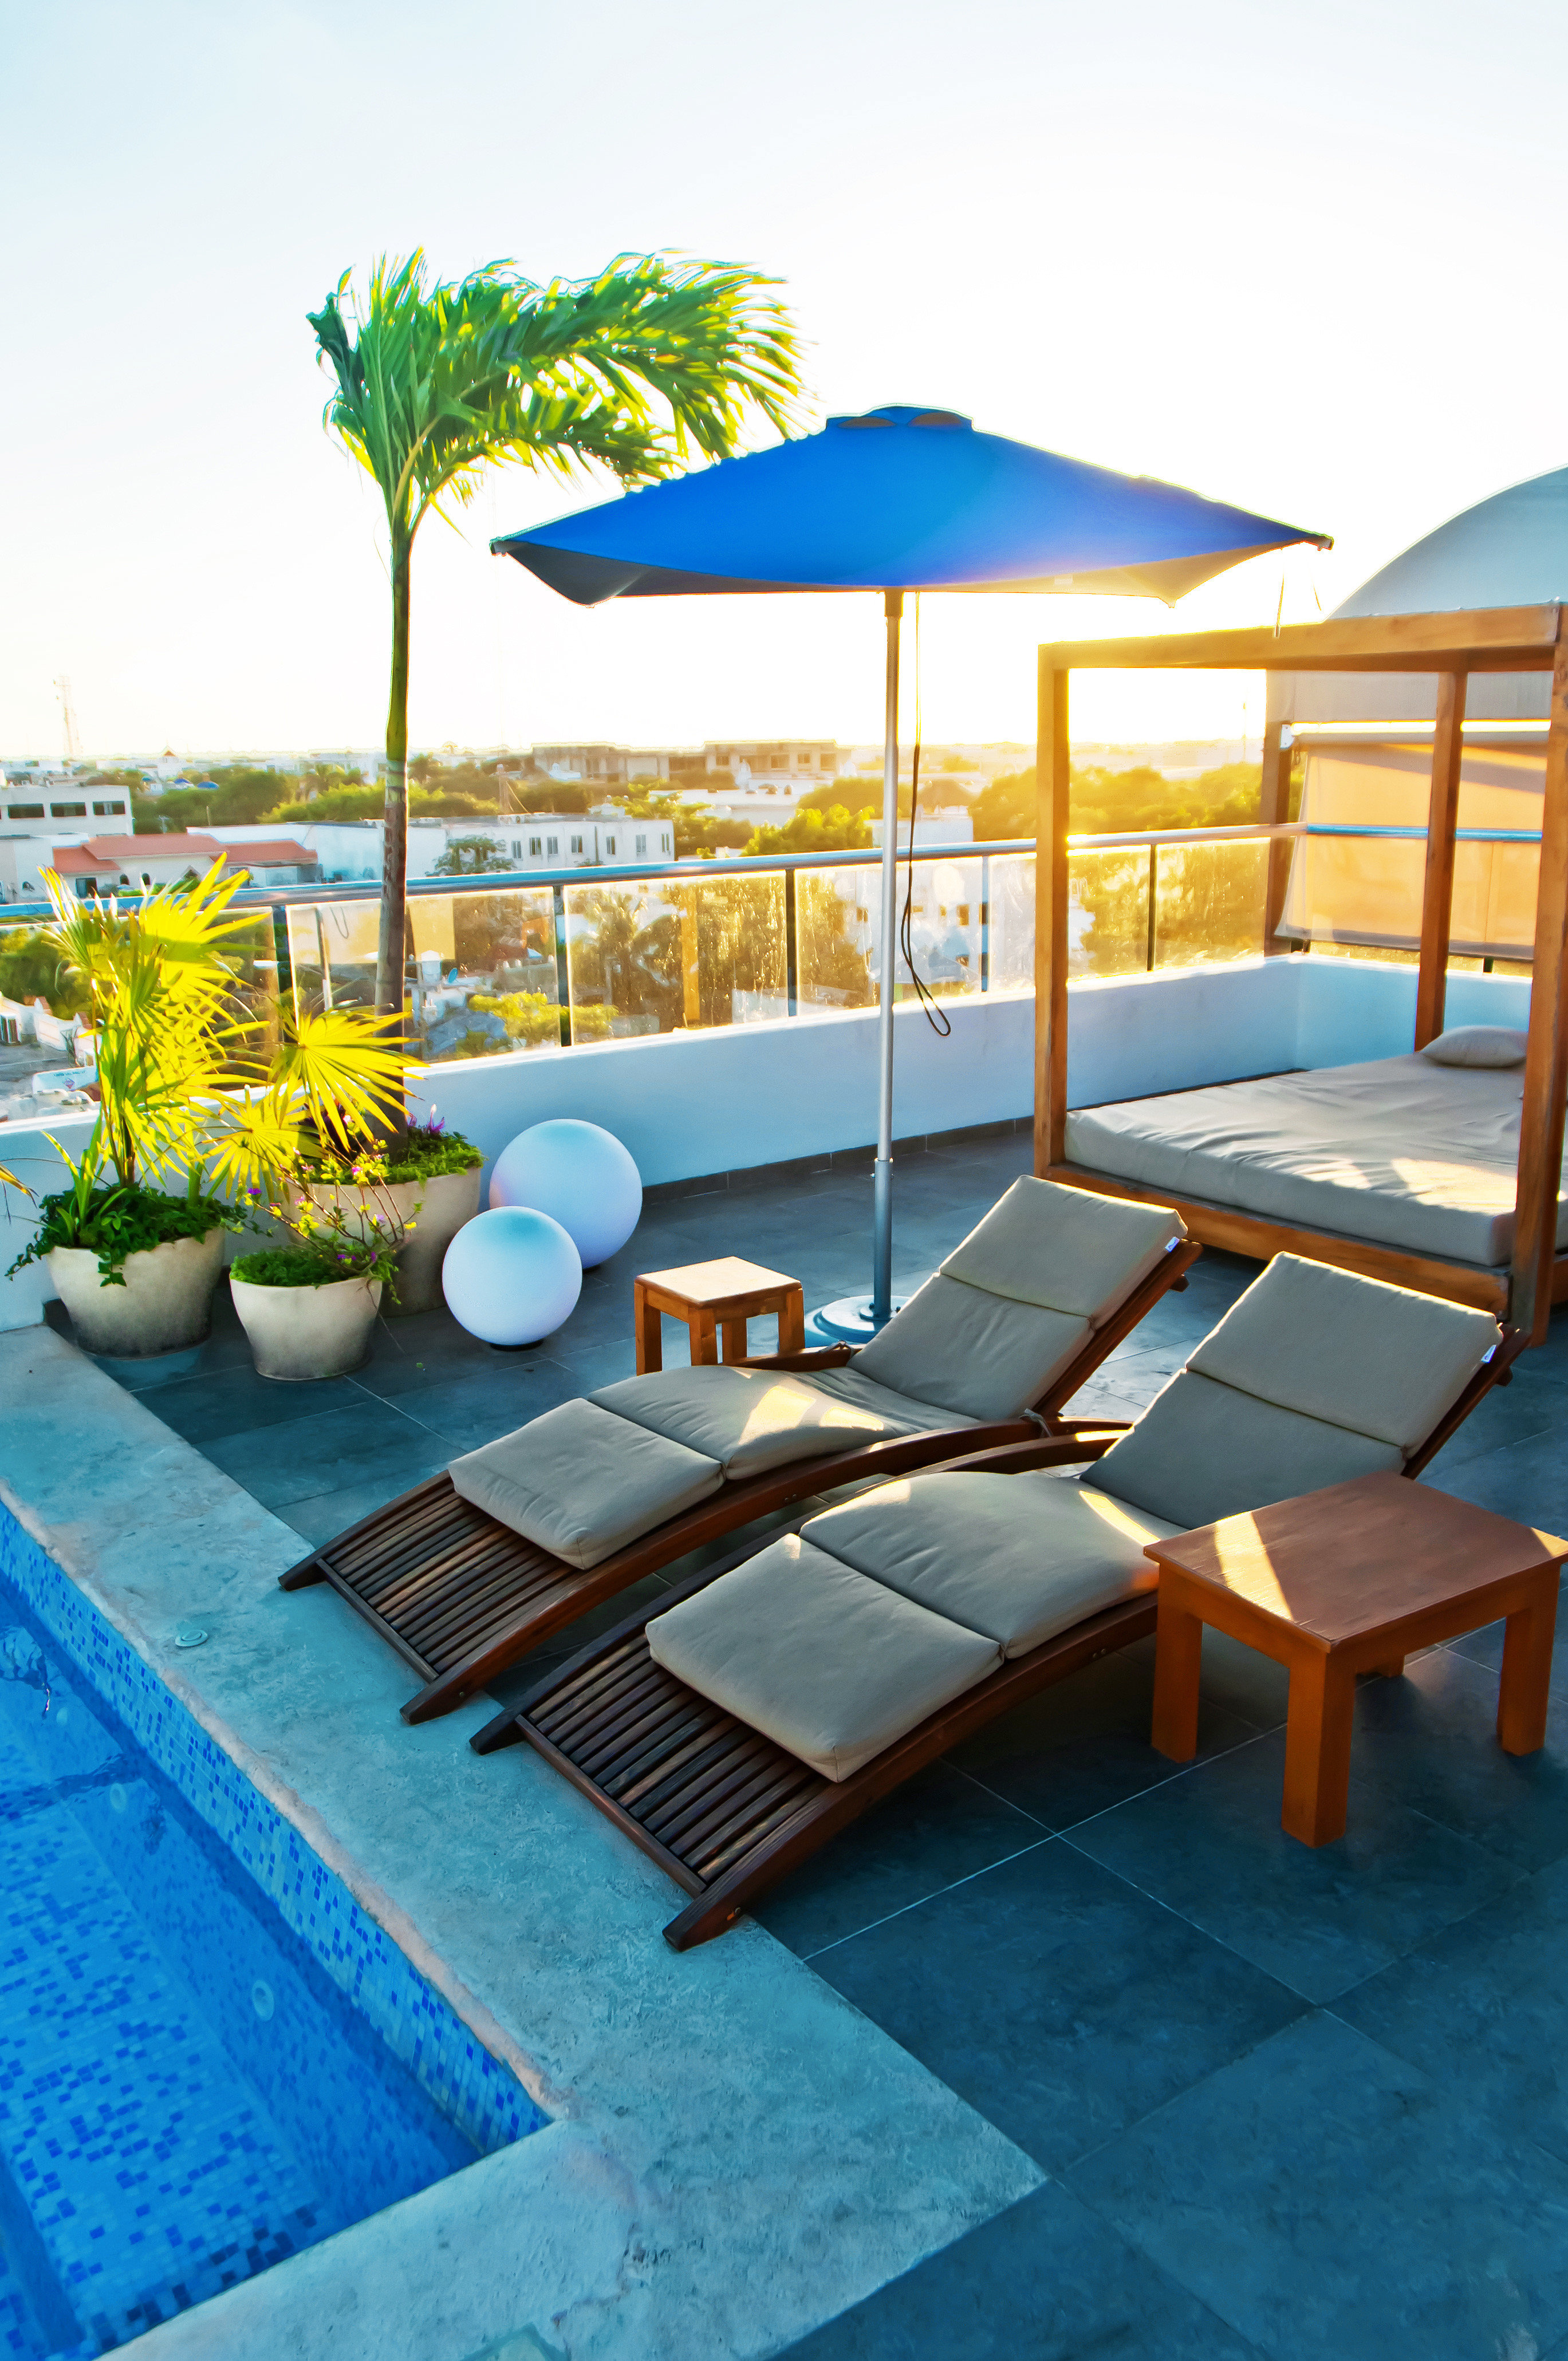 Luxury Patio Pool Rooftop Waterfront chair leisure swimming pool property Resort caribbean Villa condominium backyard